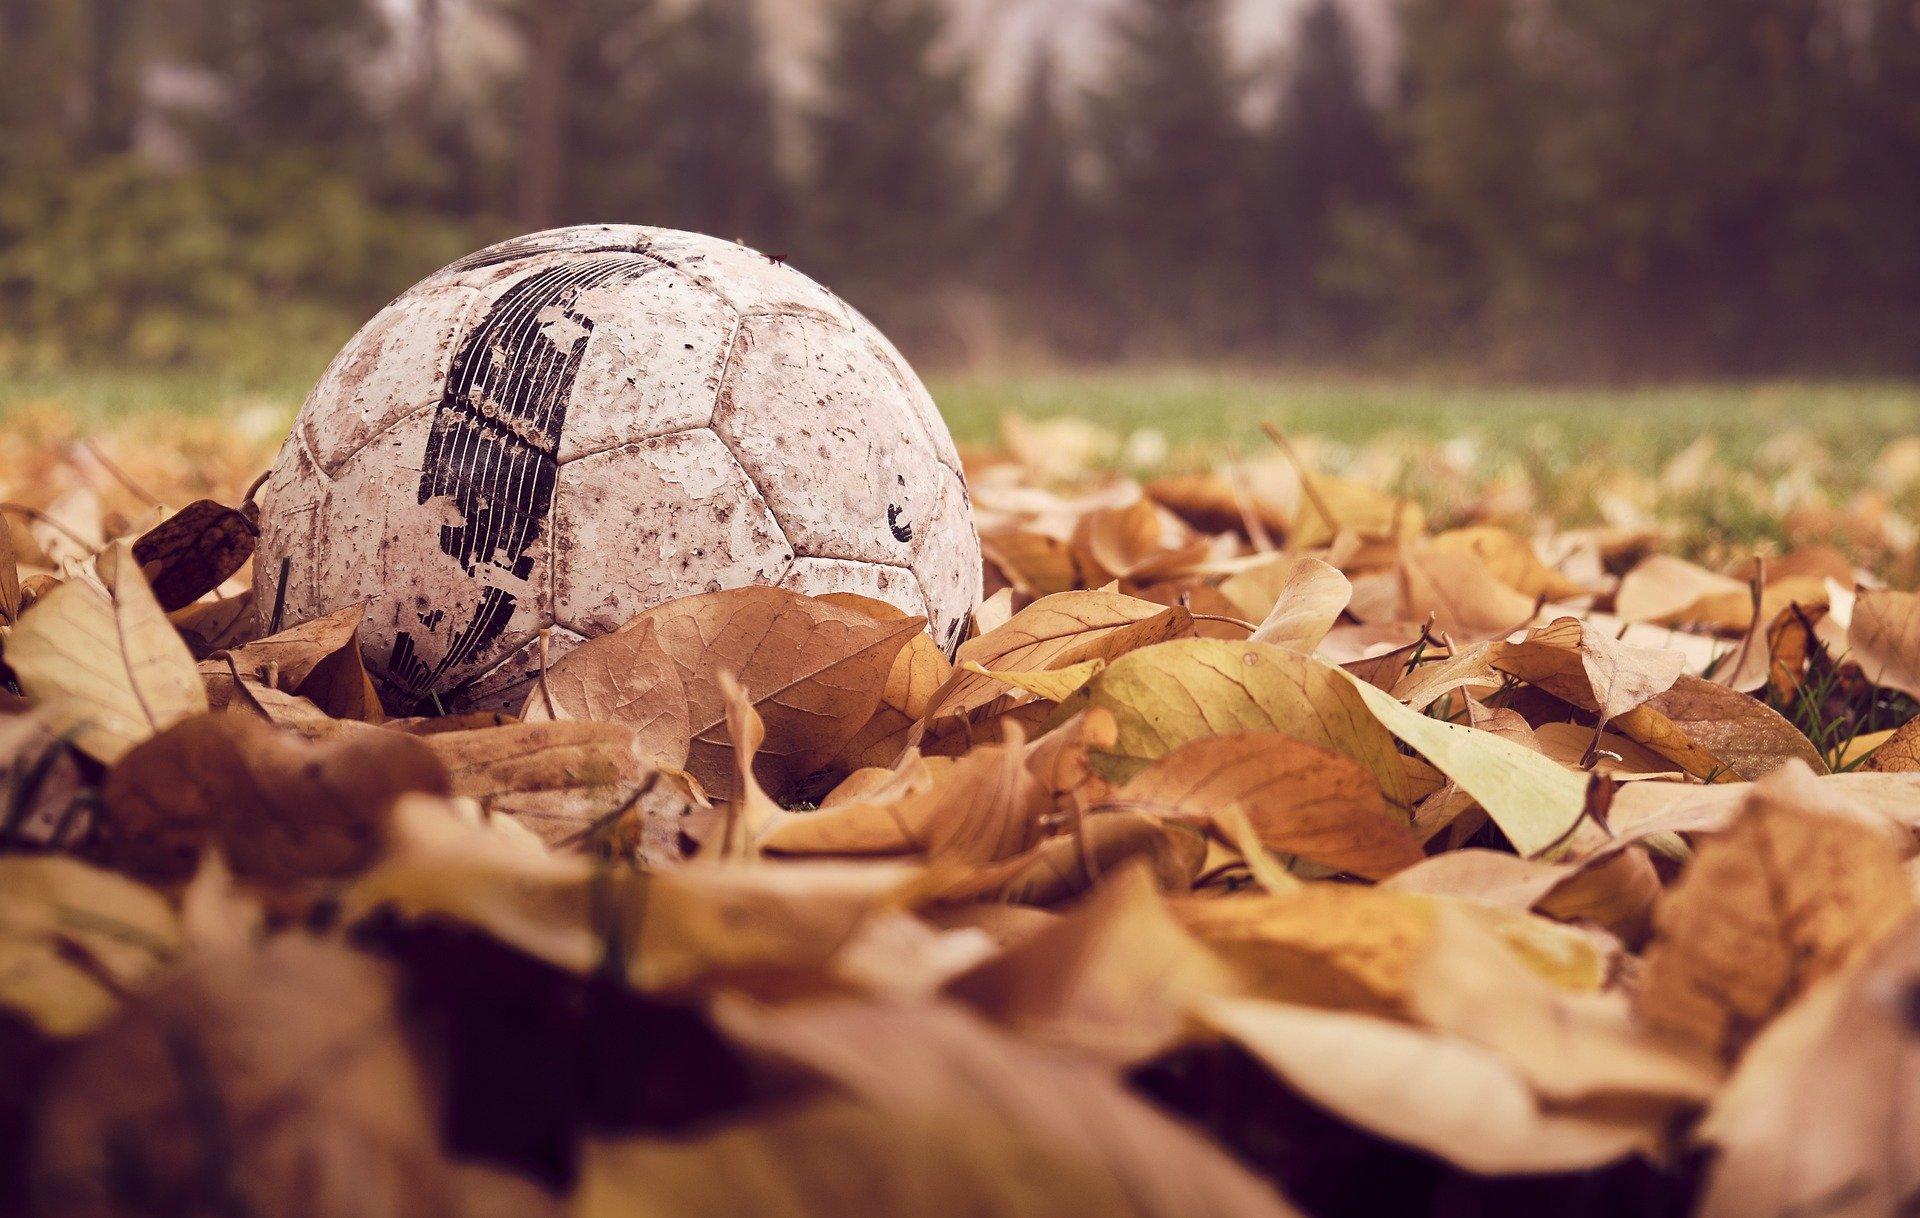 A labdarúgás őskora